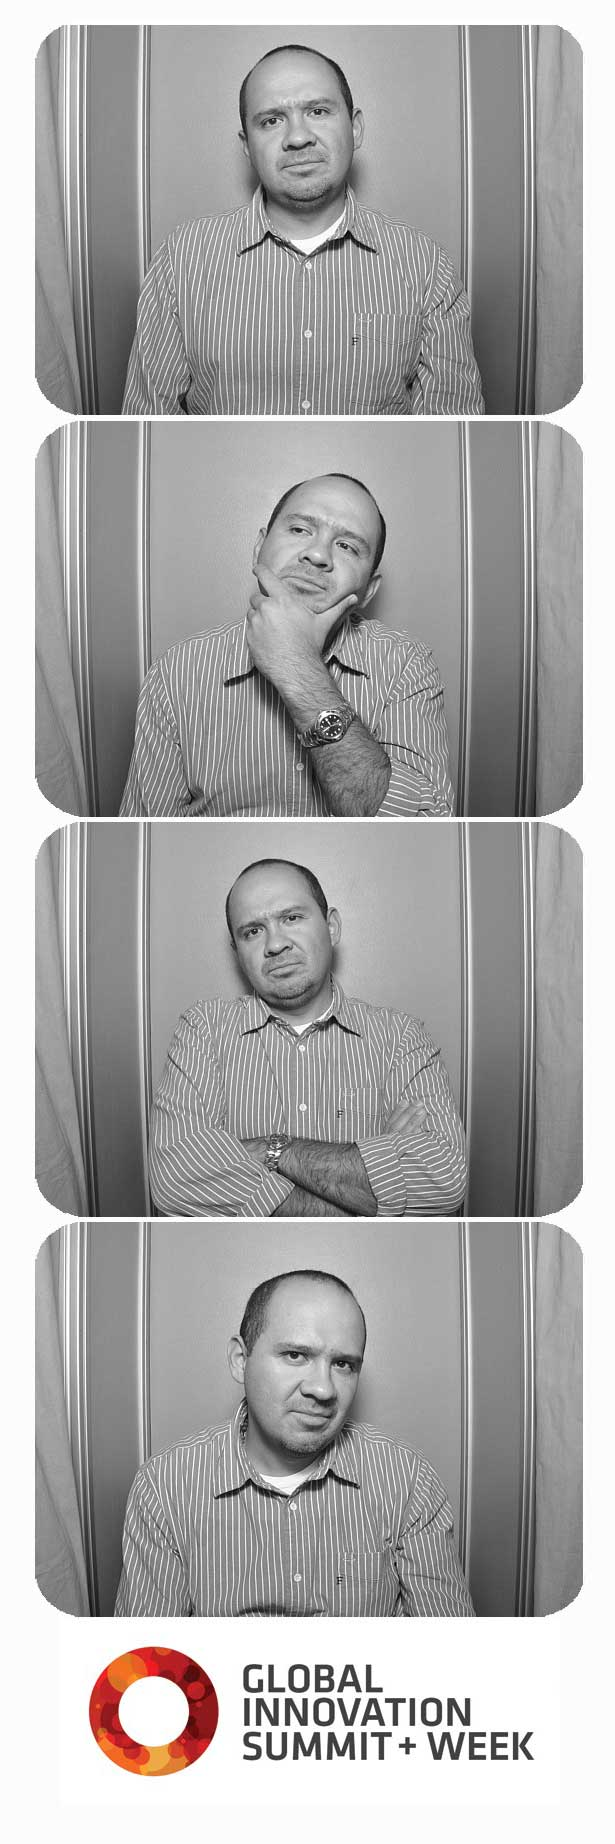 photo-booth-_231.jpg